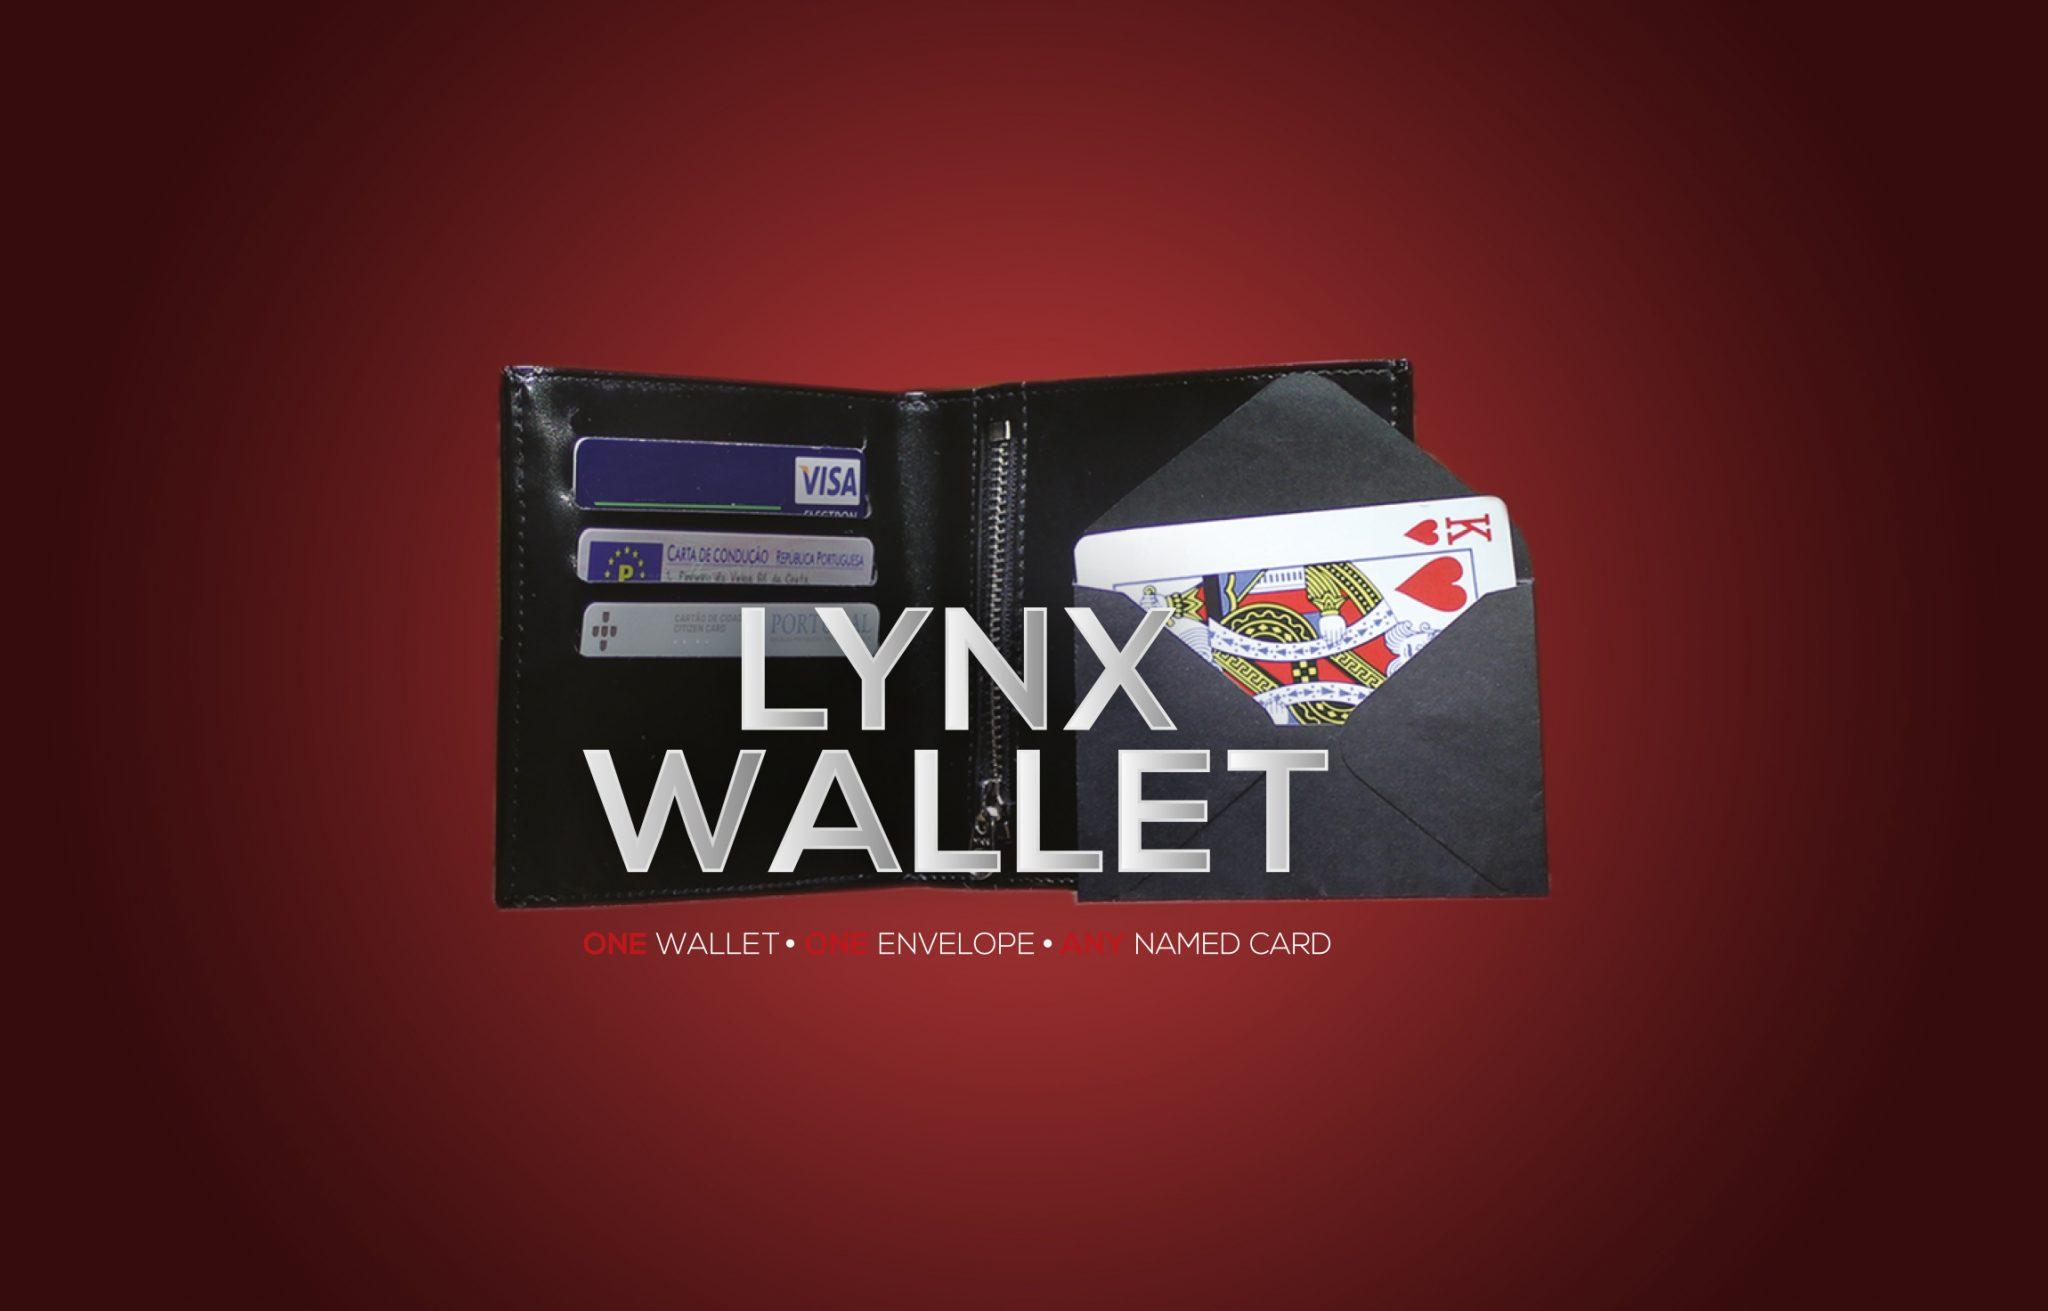 Lynx Wallet